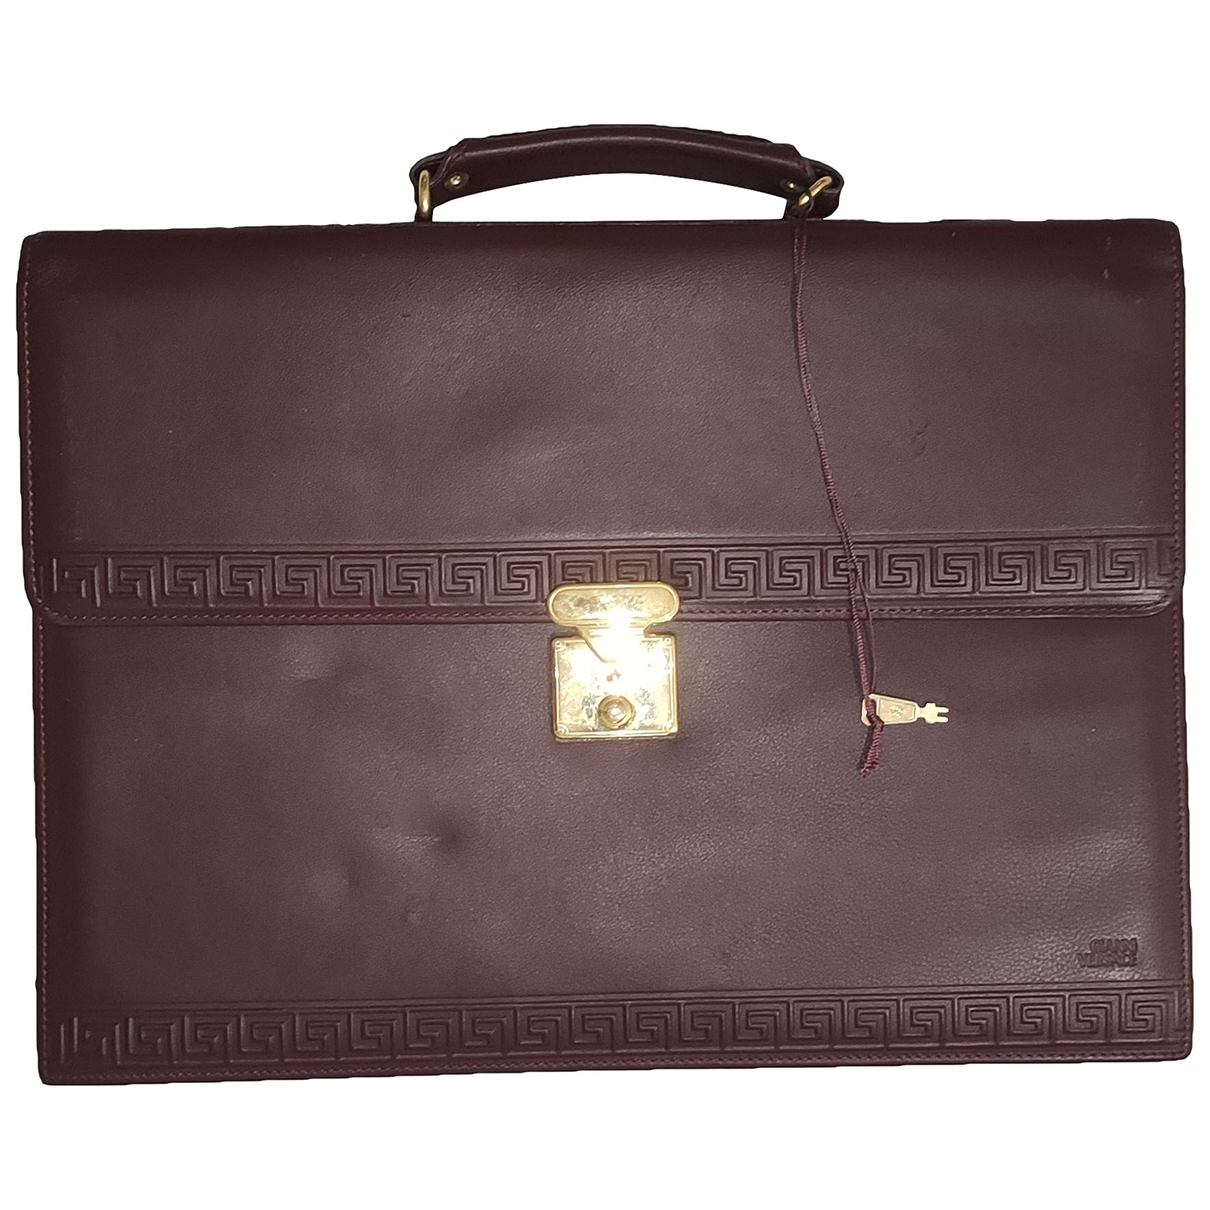 Gianni Versace \N Brown Leather handbag for Women \N